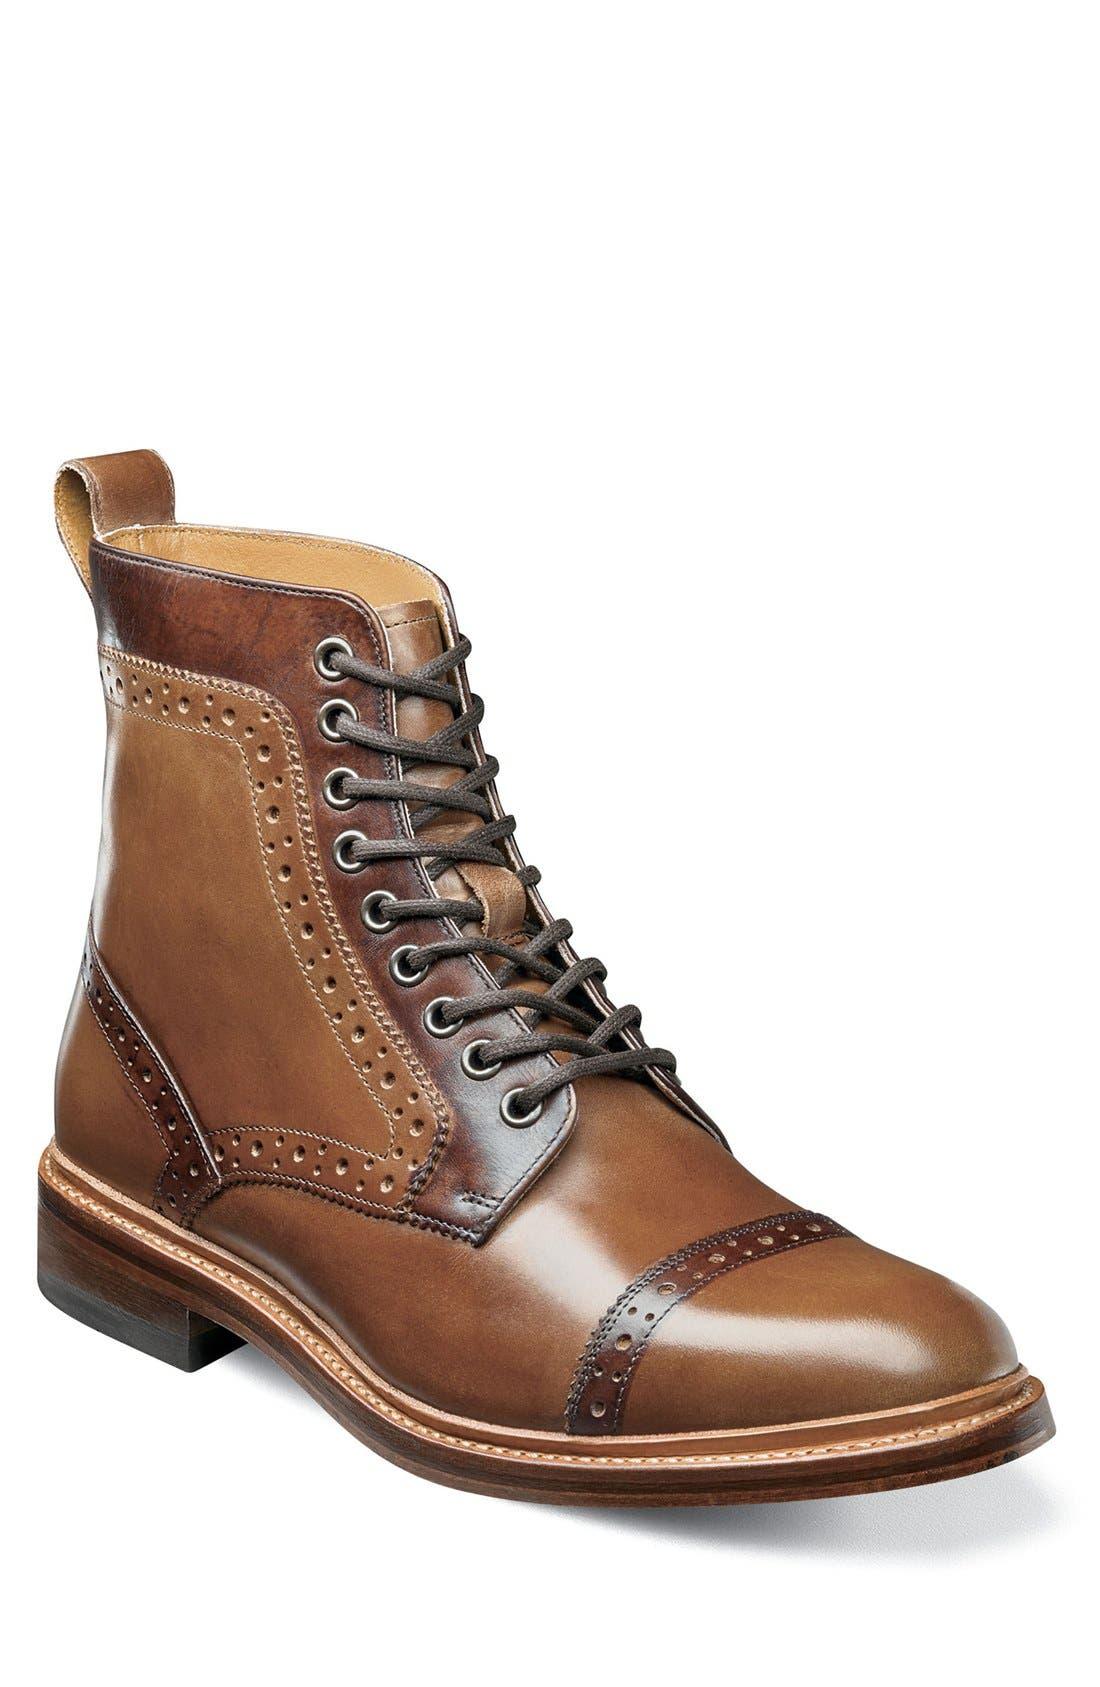 Alternate Image 1 Selected - Stacy Adams Madison II Cap Toe Lace Boot (Men)